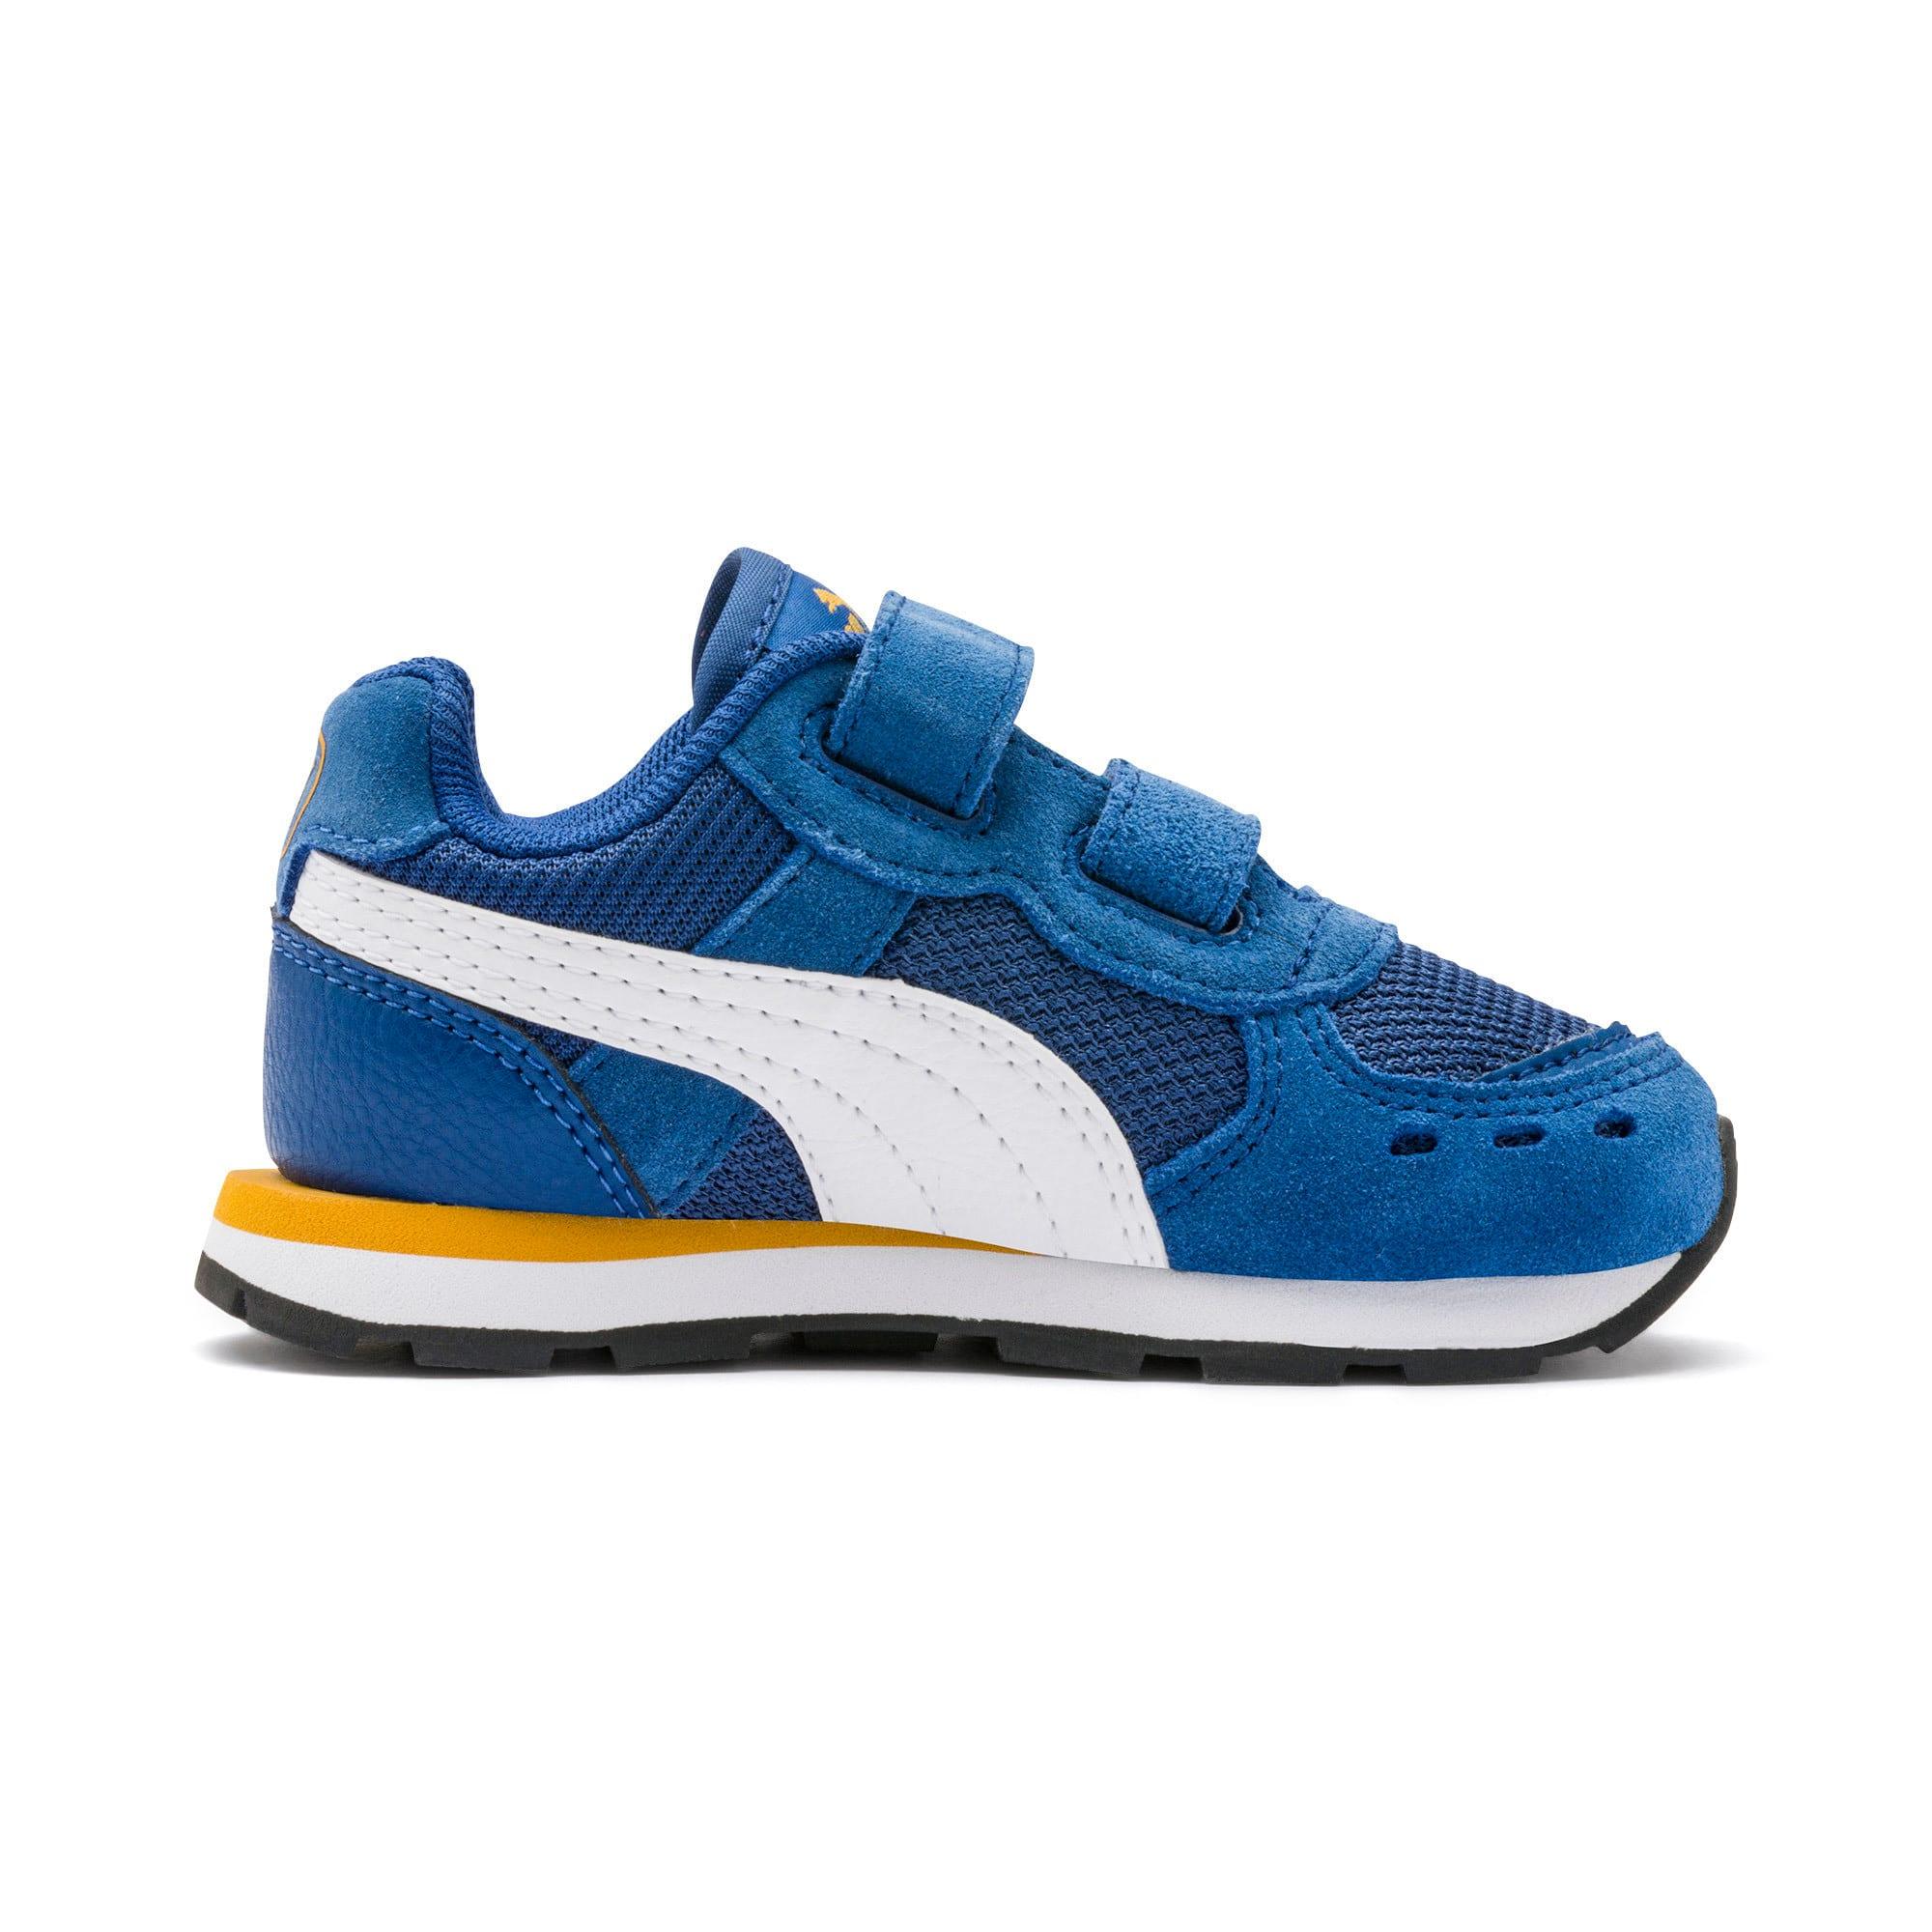 Thumbnail 5 of Vista Toddler Shoes, Galaxy Blue-Puma White, medium